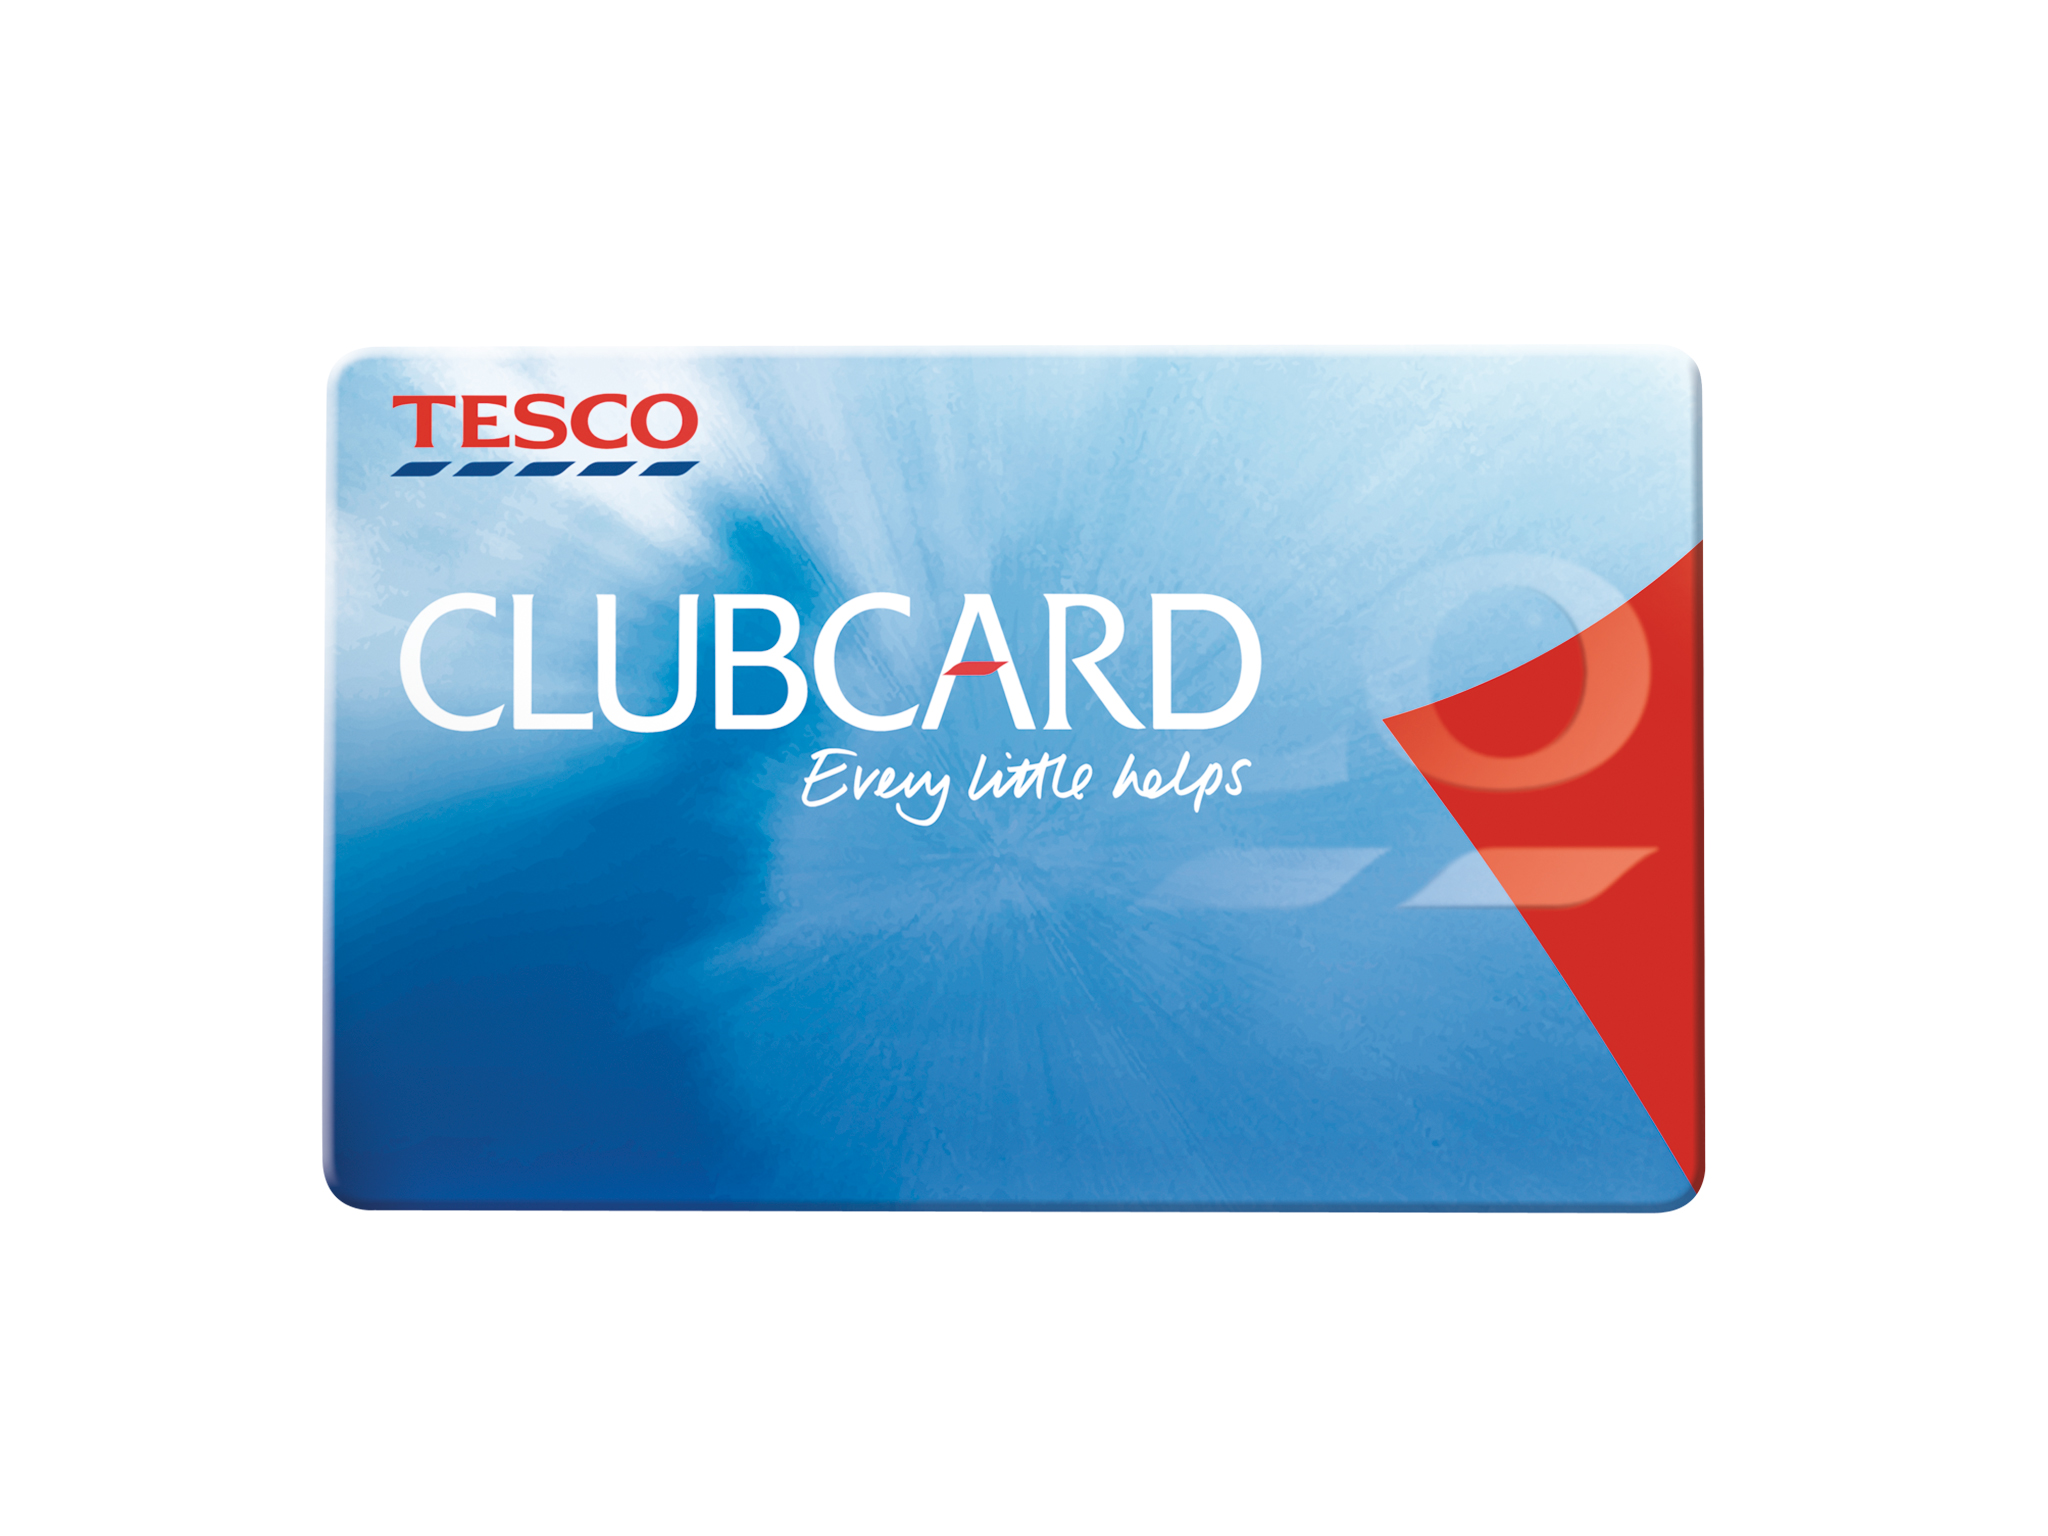 Tesco Clubcard Logo and Branding -